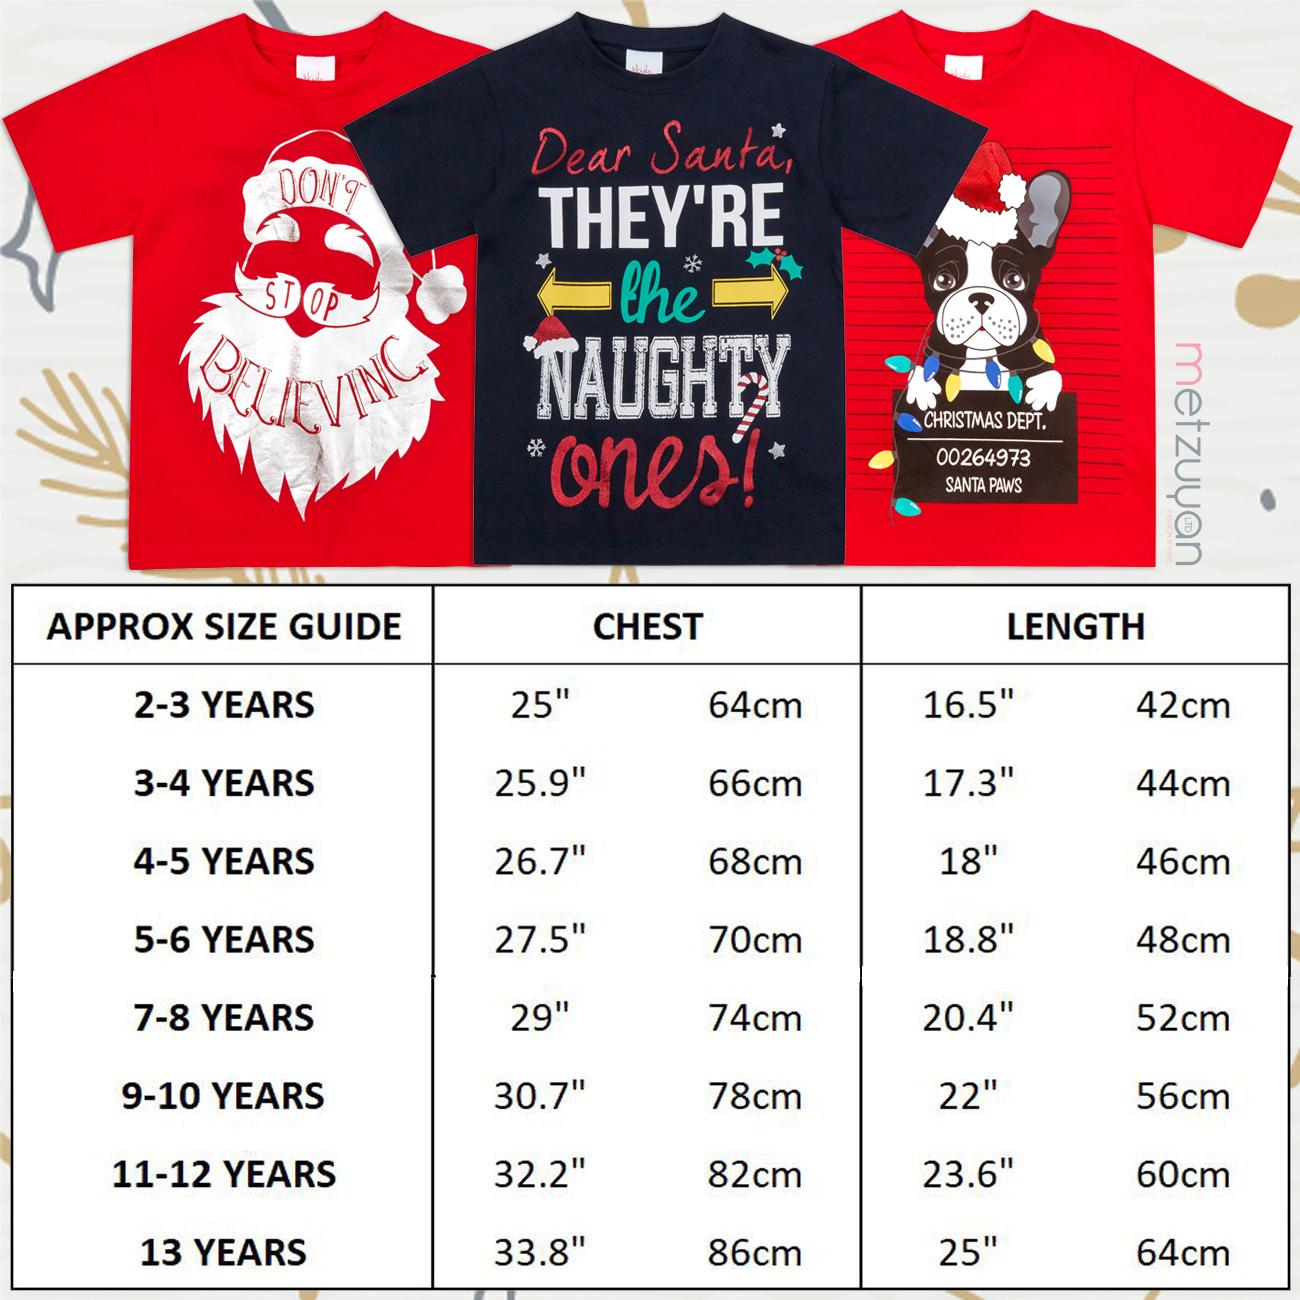 Childrens-Girls-Boys-Xmas-T-Shirts-Printed-Christmas-Design-100-Cotton-2-13-Yrs thumbnail 32